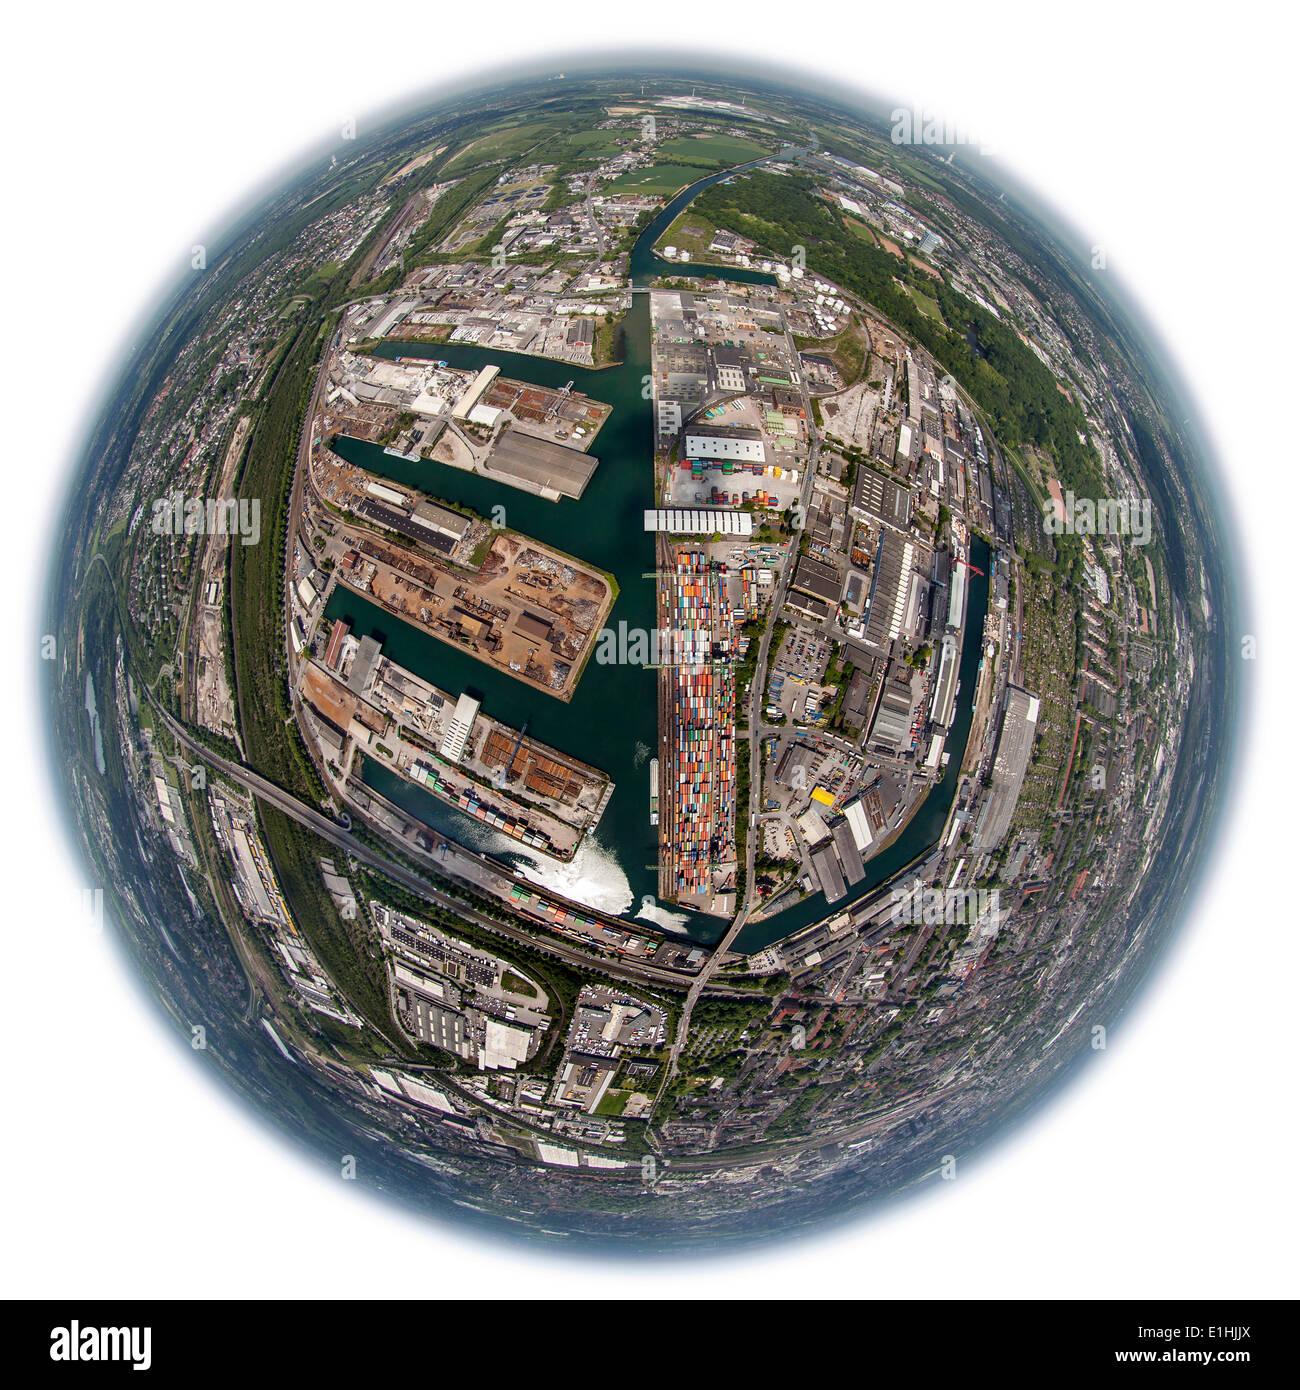 Aerial view, fisheye, Dortmund port with container terminal, Dortmund, Ruhr district, North Rhine-Westphalia, Germany - Stock Image